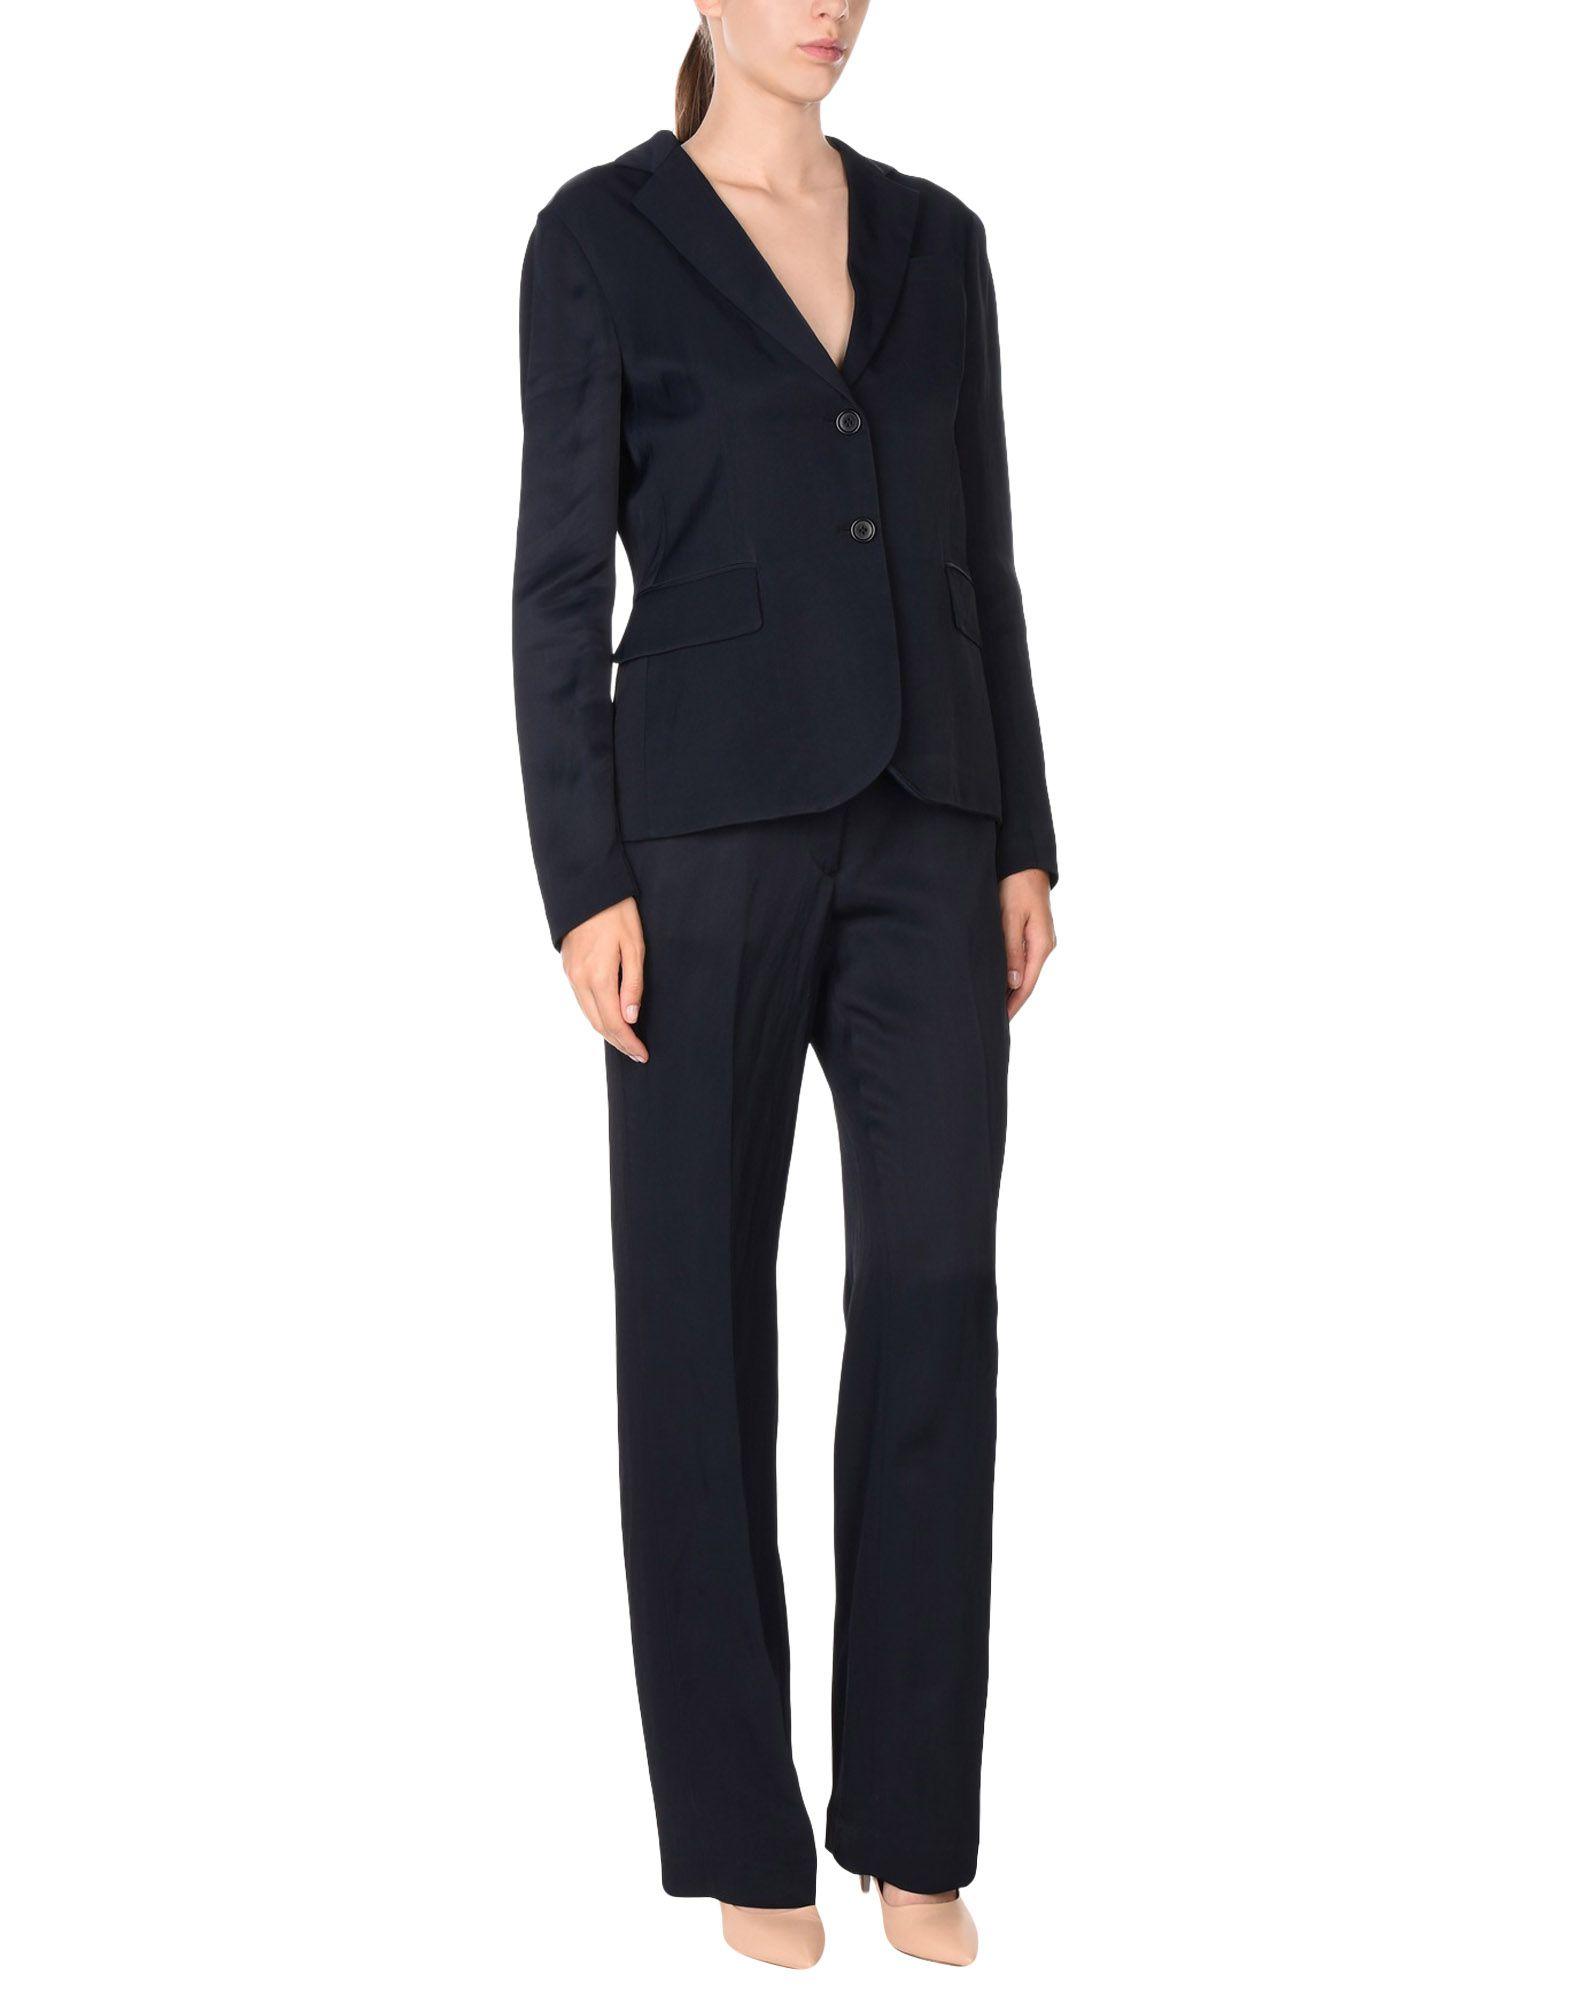 aspesi design by lawrence steele классический костюм ASPESI Классический костюм